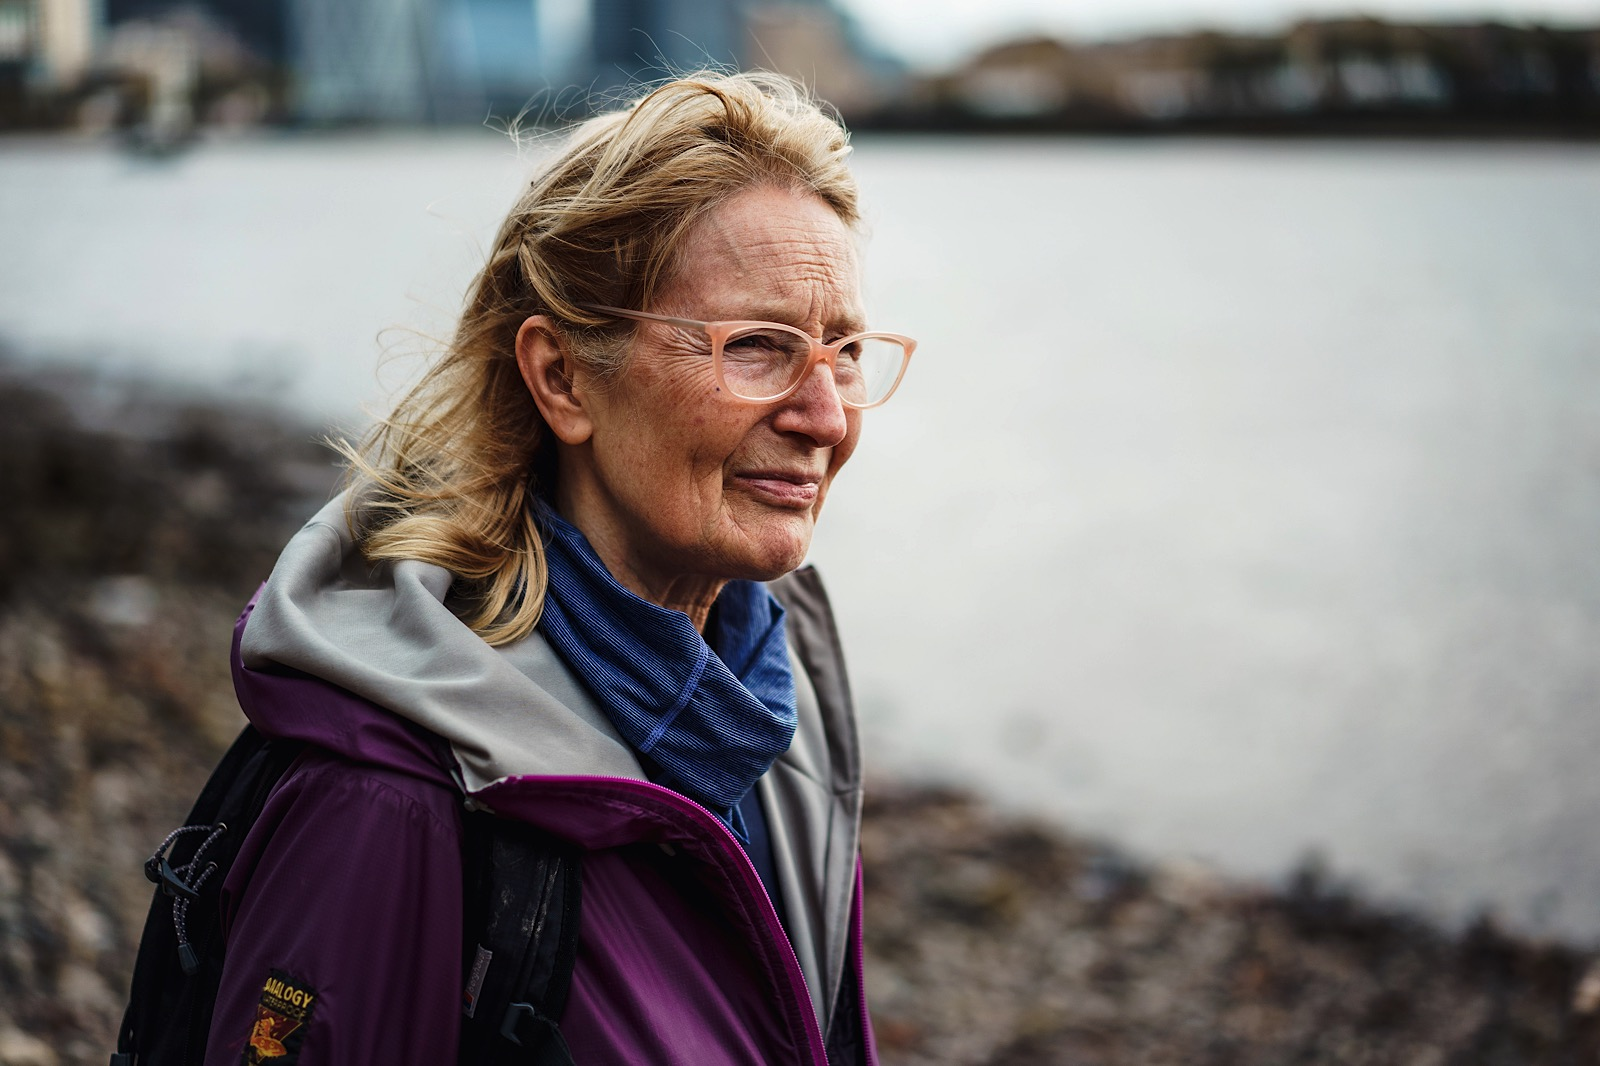 Karen Turner - A London Mudlarker